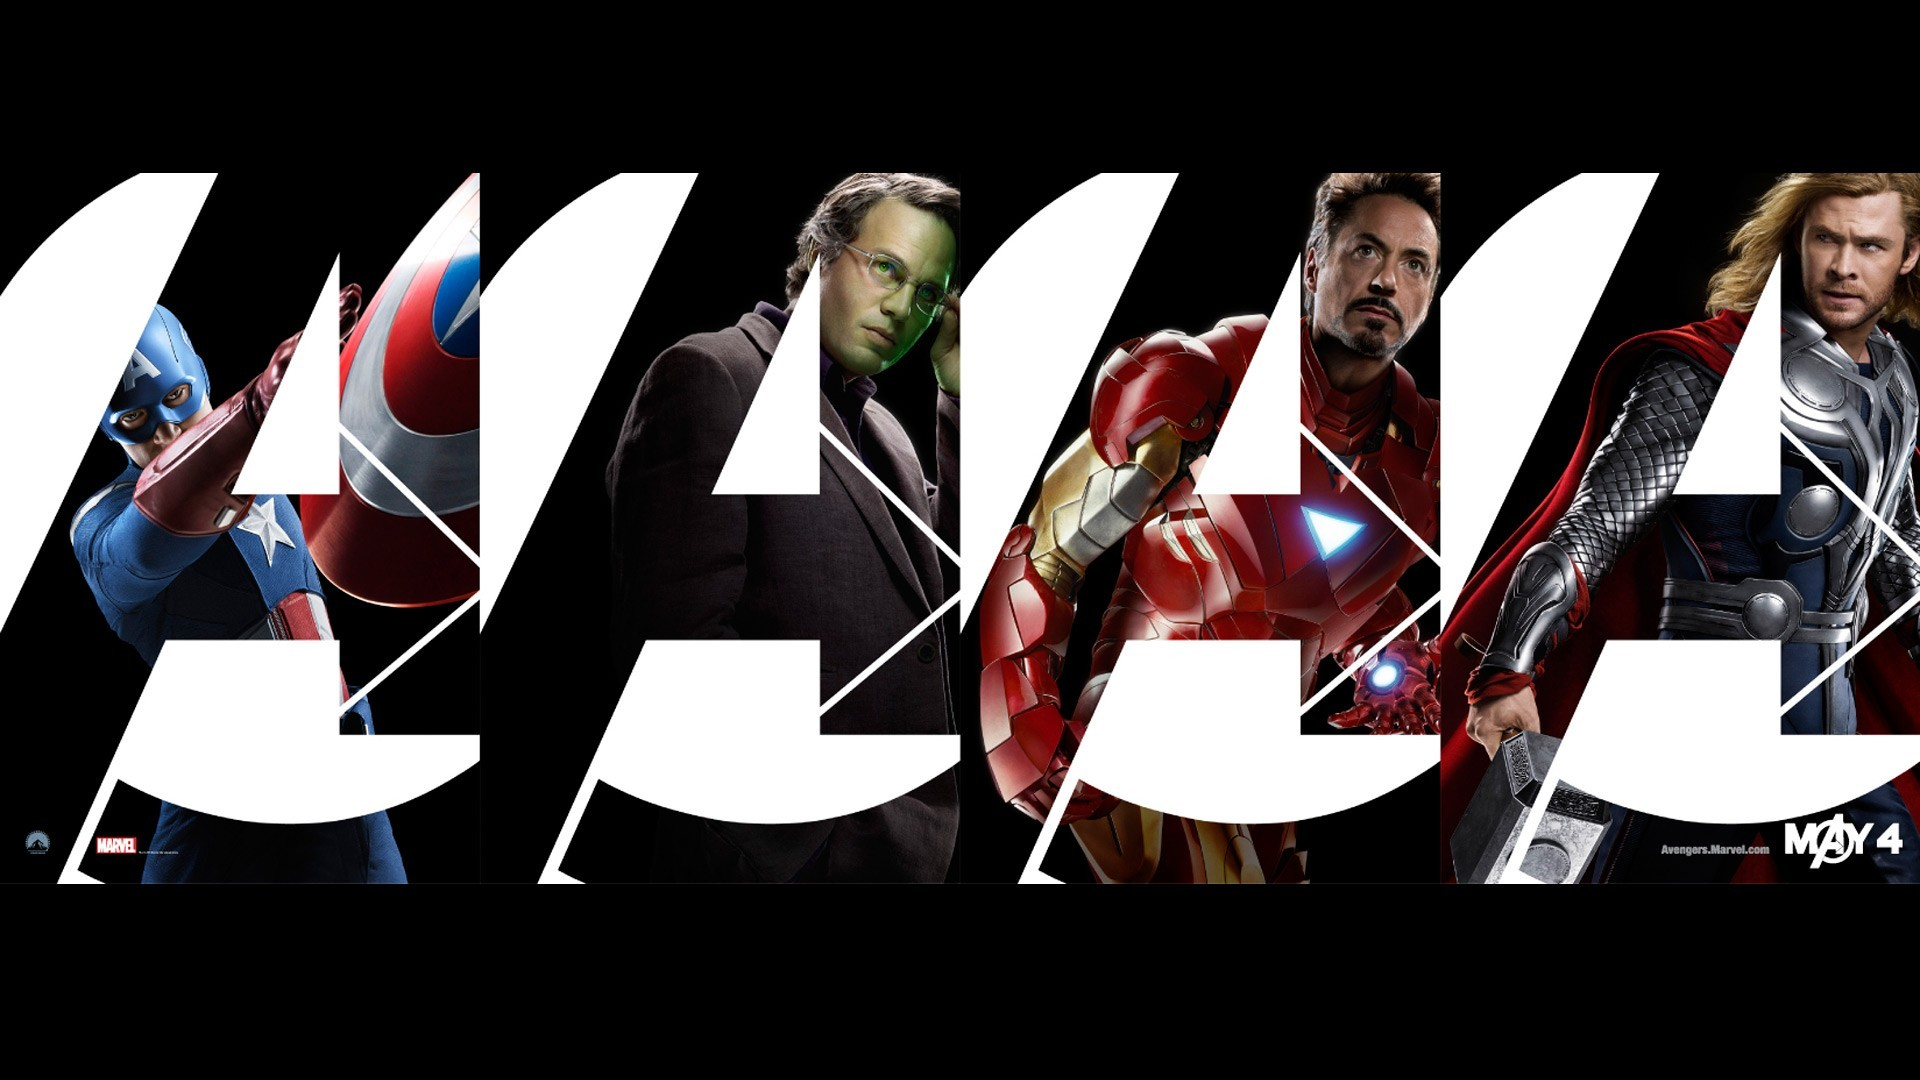 General 1920x1080 movies The Avengers Thor Iron Man Captain America Hulk Bruce Banner Chris Hemsworth Chris Evans Mark Ruffalo Robert Downey Jr. Marvel Cinematic Universe